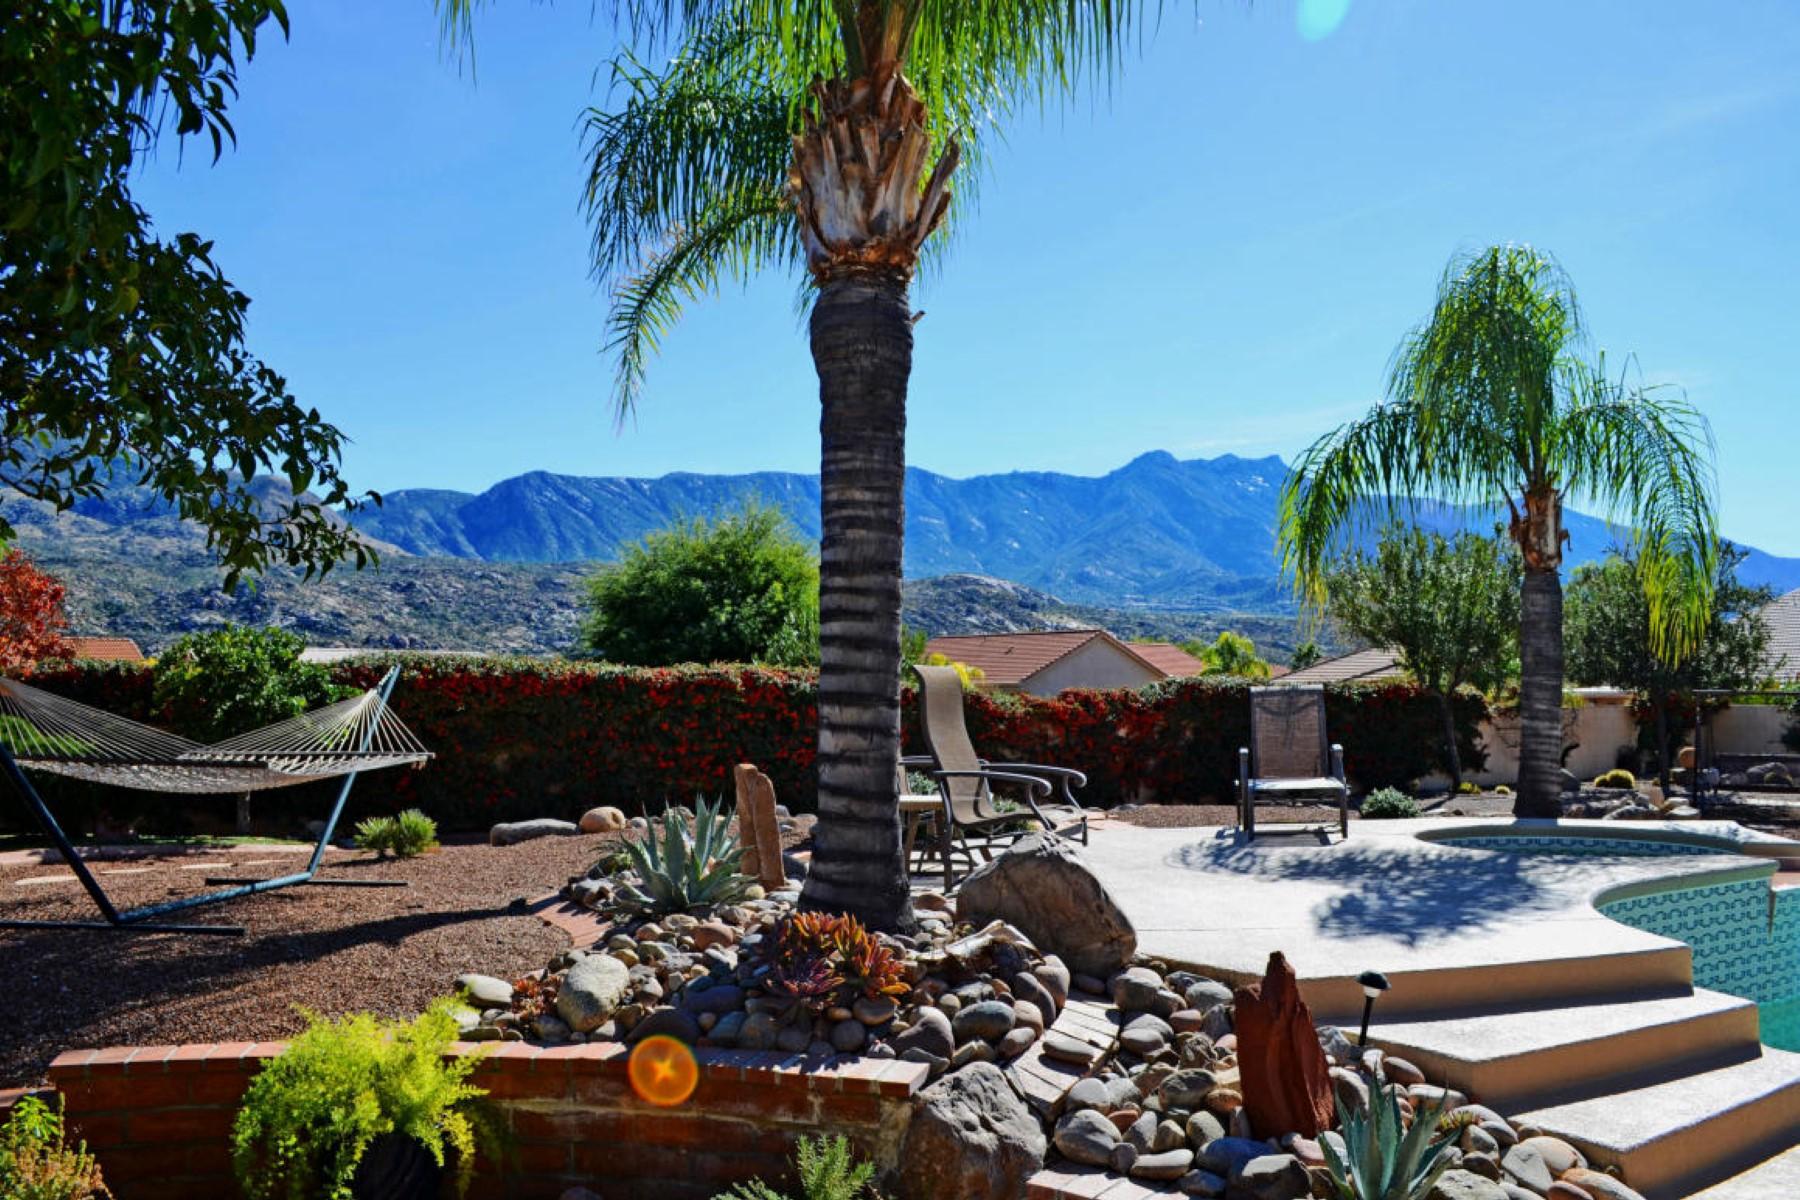 Moradia para Venda às Beautifully appointed Topaz model in the shadow of the Catalina Mountains 37467 S Ridgeview Boulevard Tucson, Arizona 85739 Estados Unidos